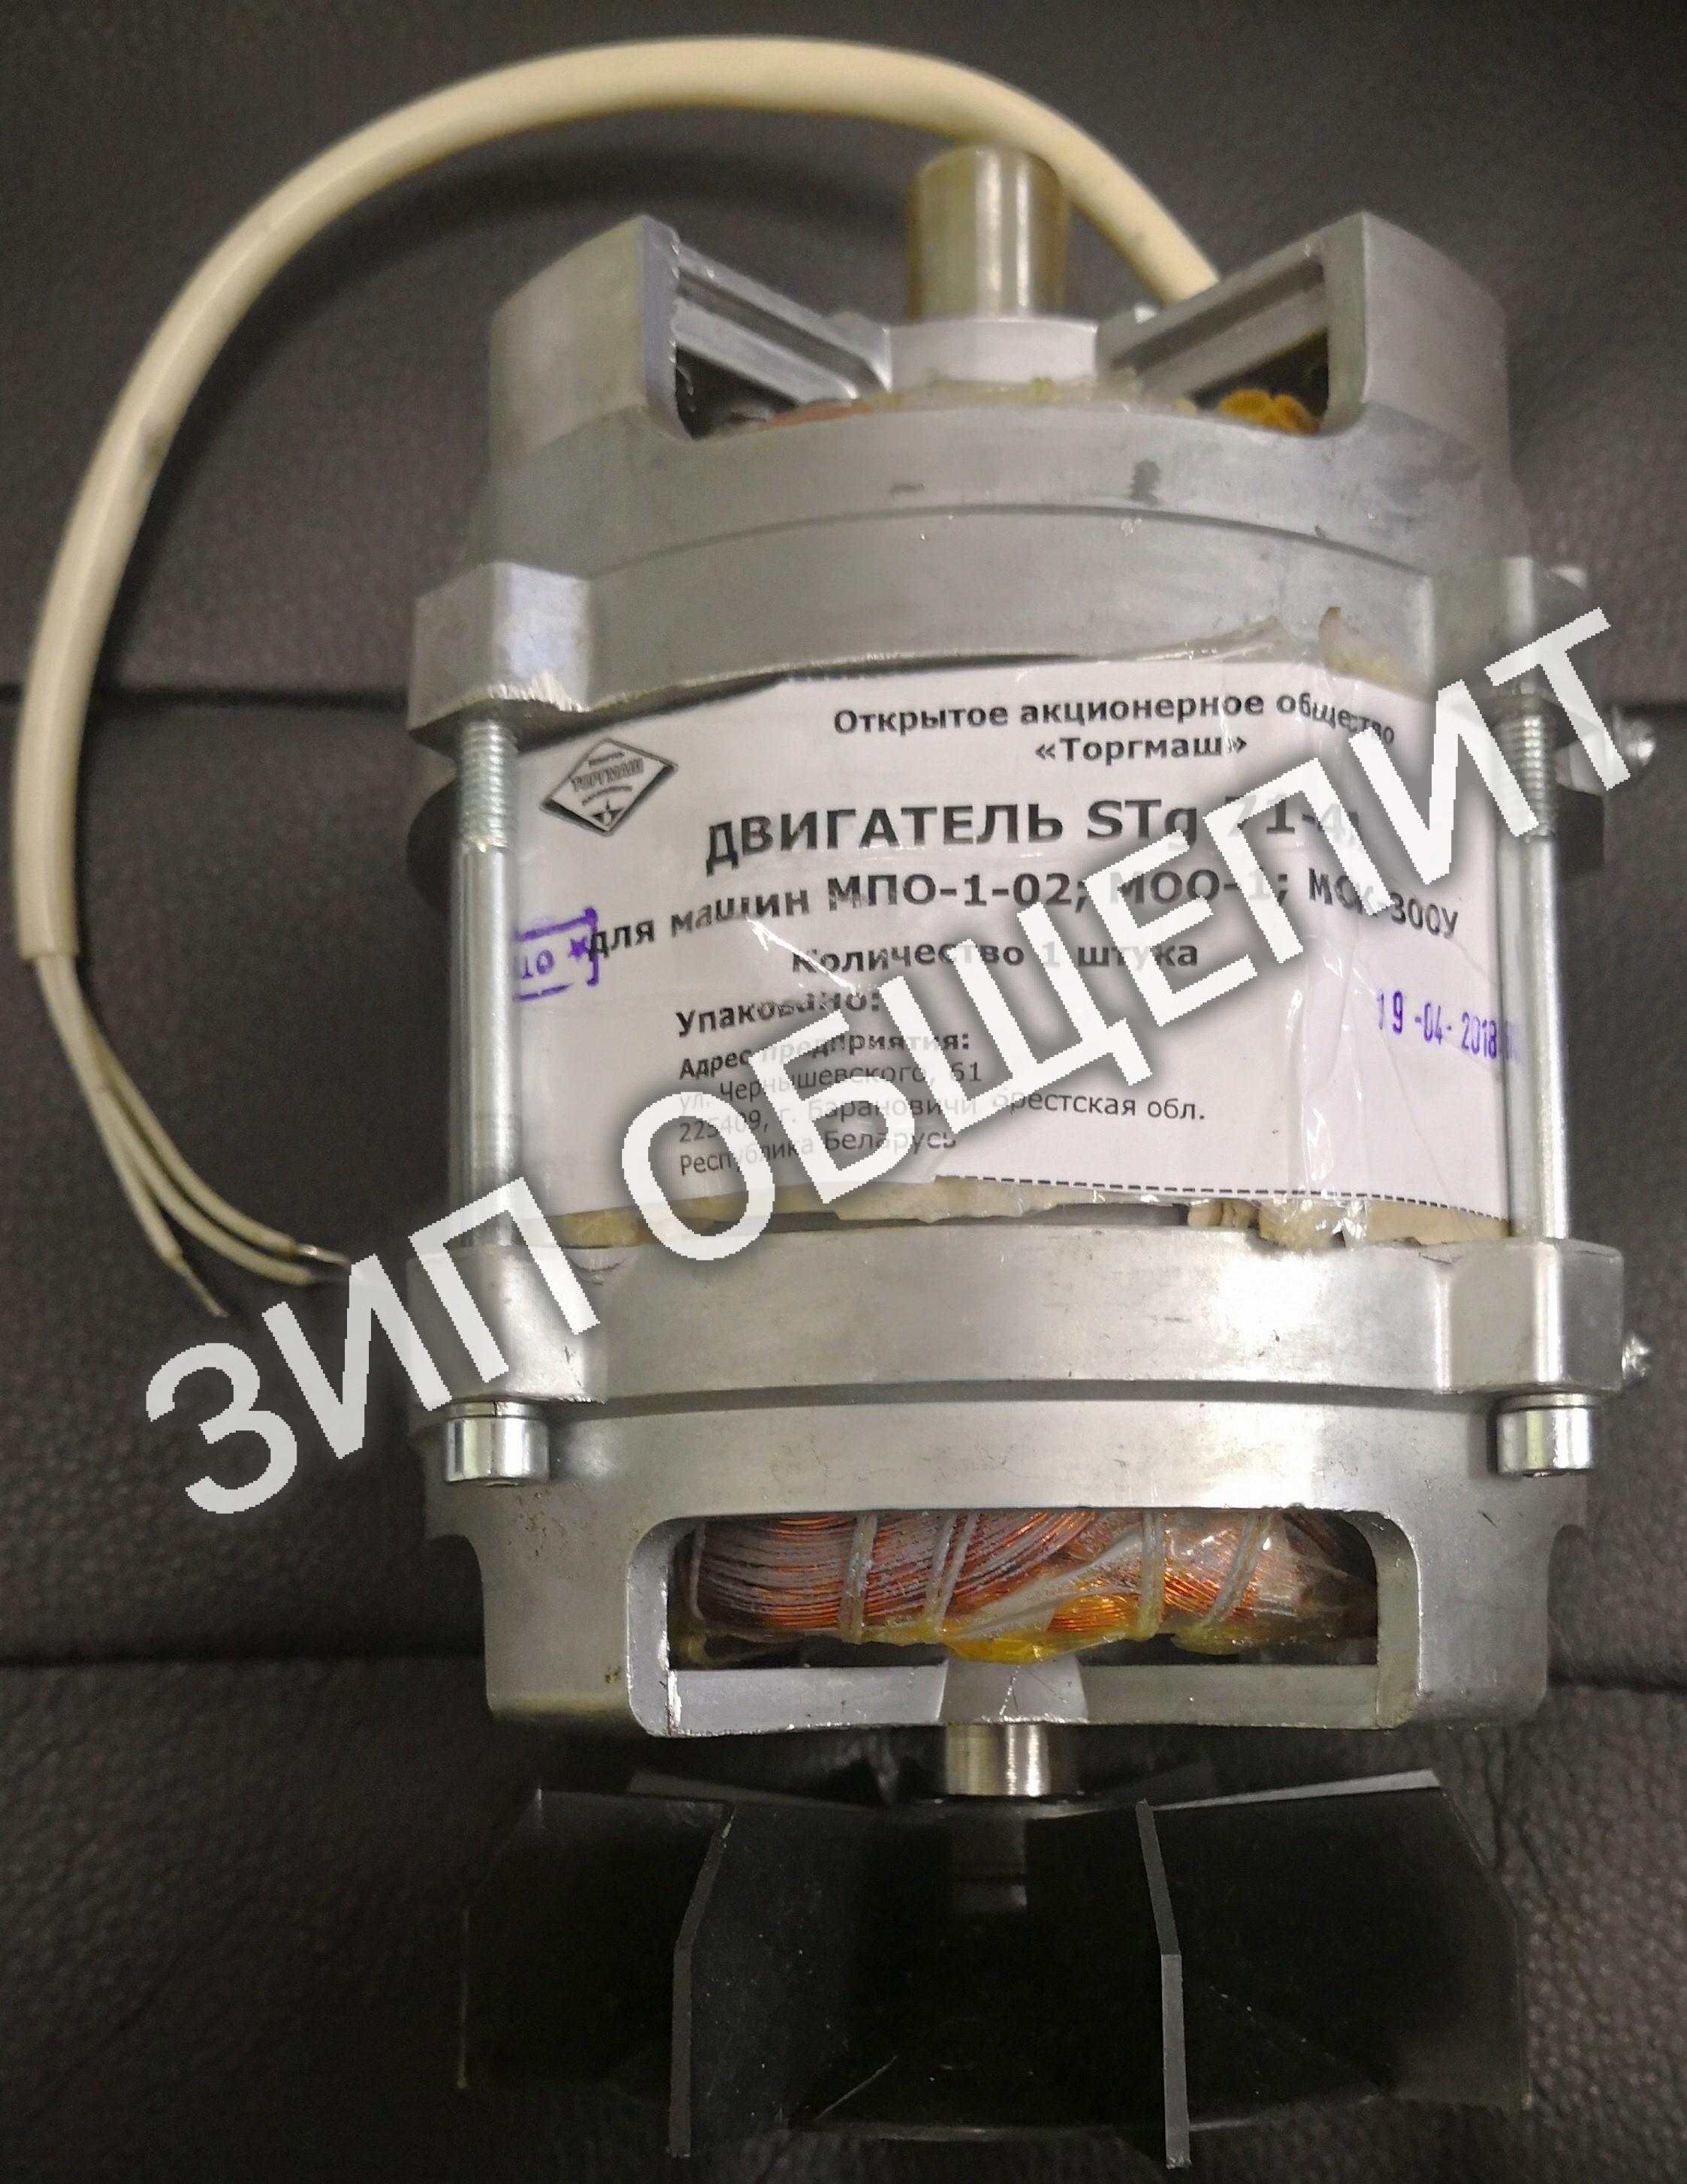 Двигатель мотор МПО-1-02,МОК-300У, МОО-1 АИР 71А4 0,55/1400 комби 220/380В